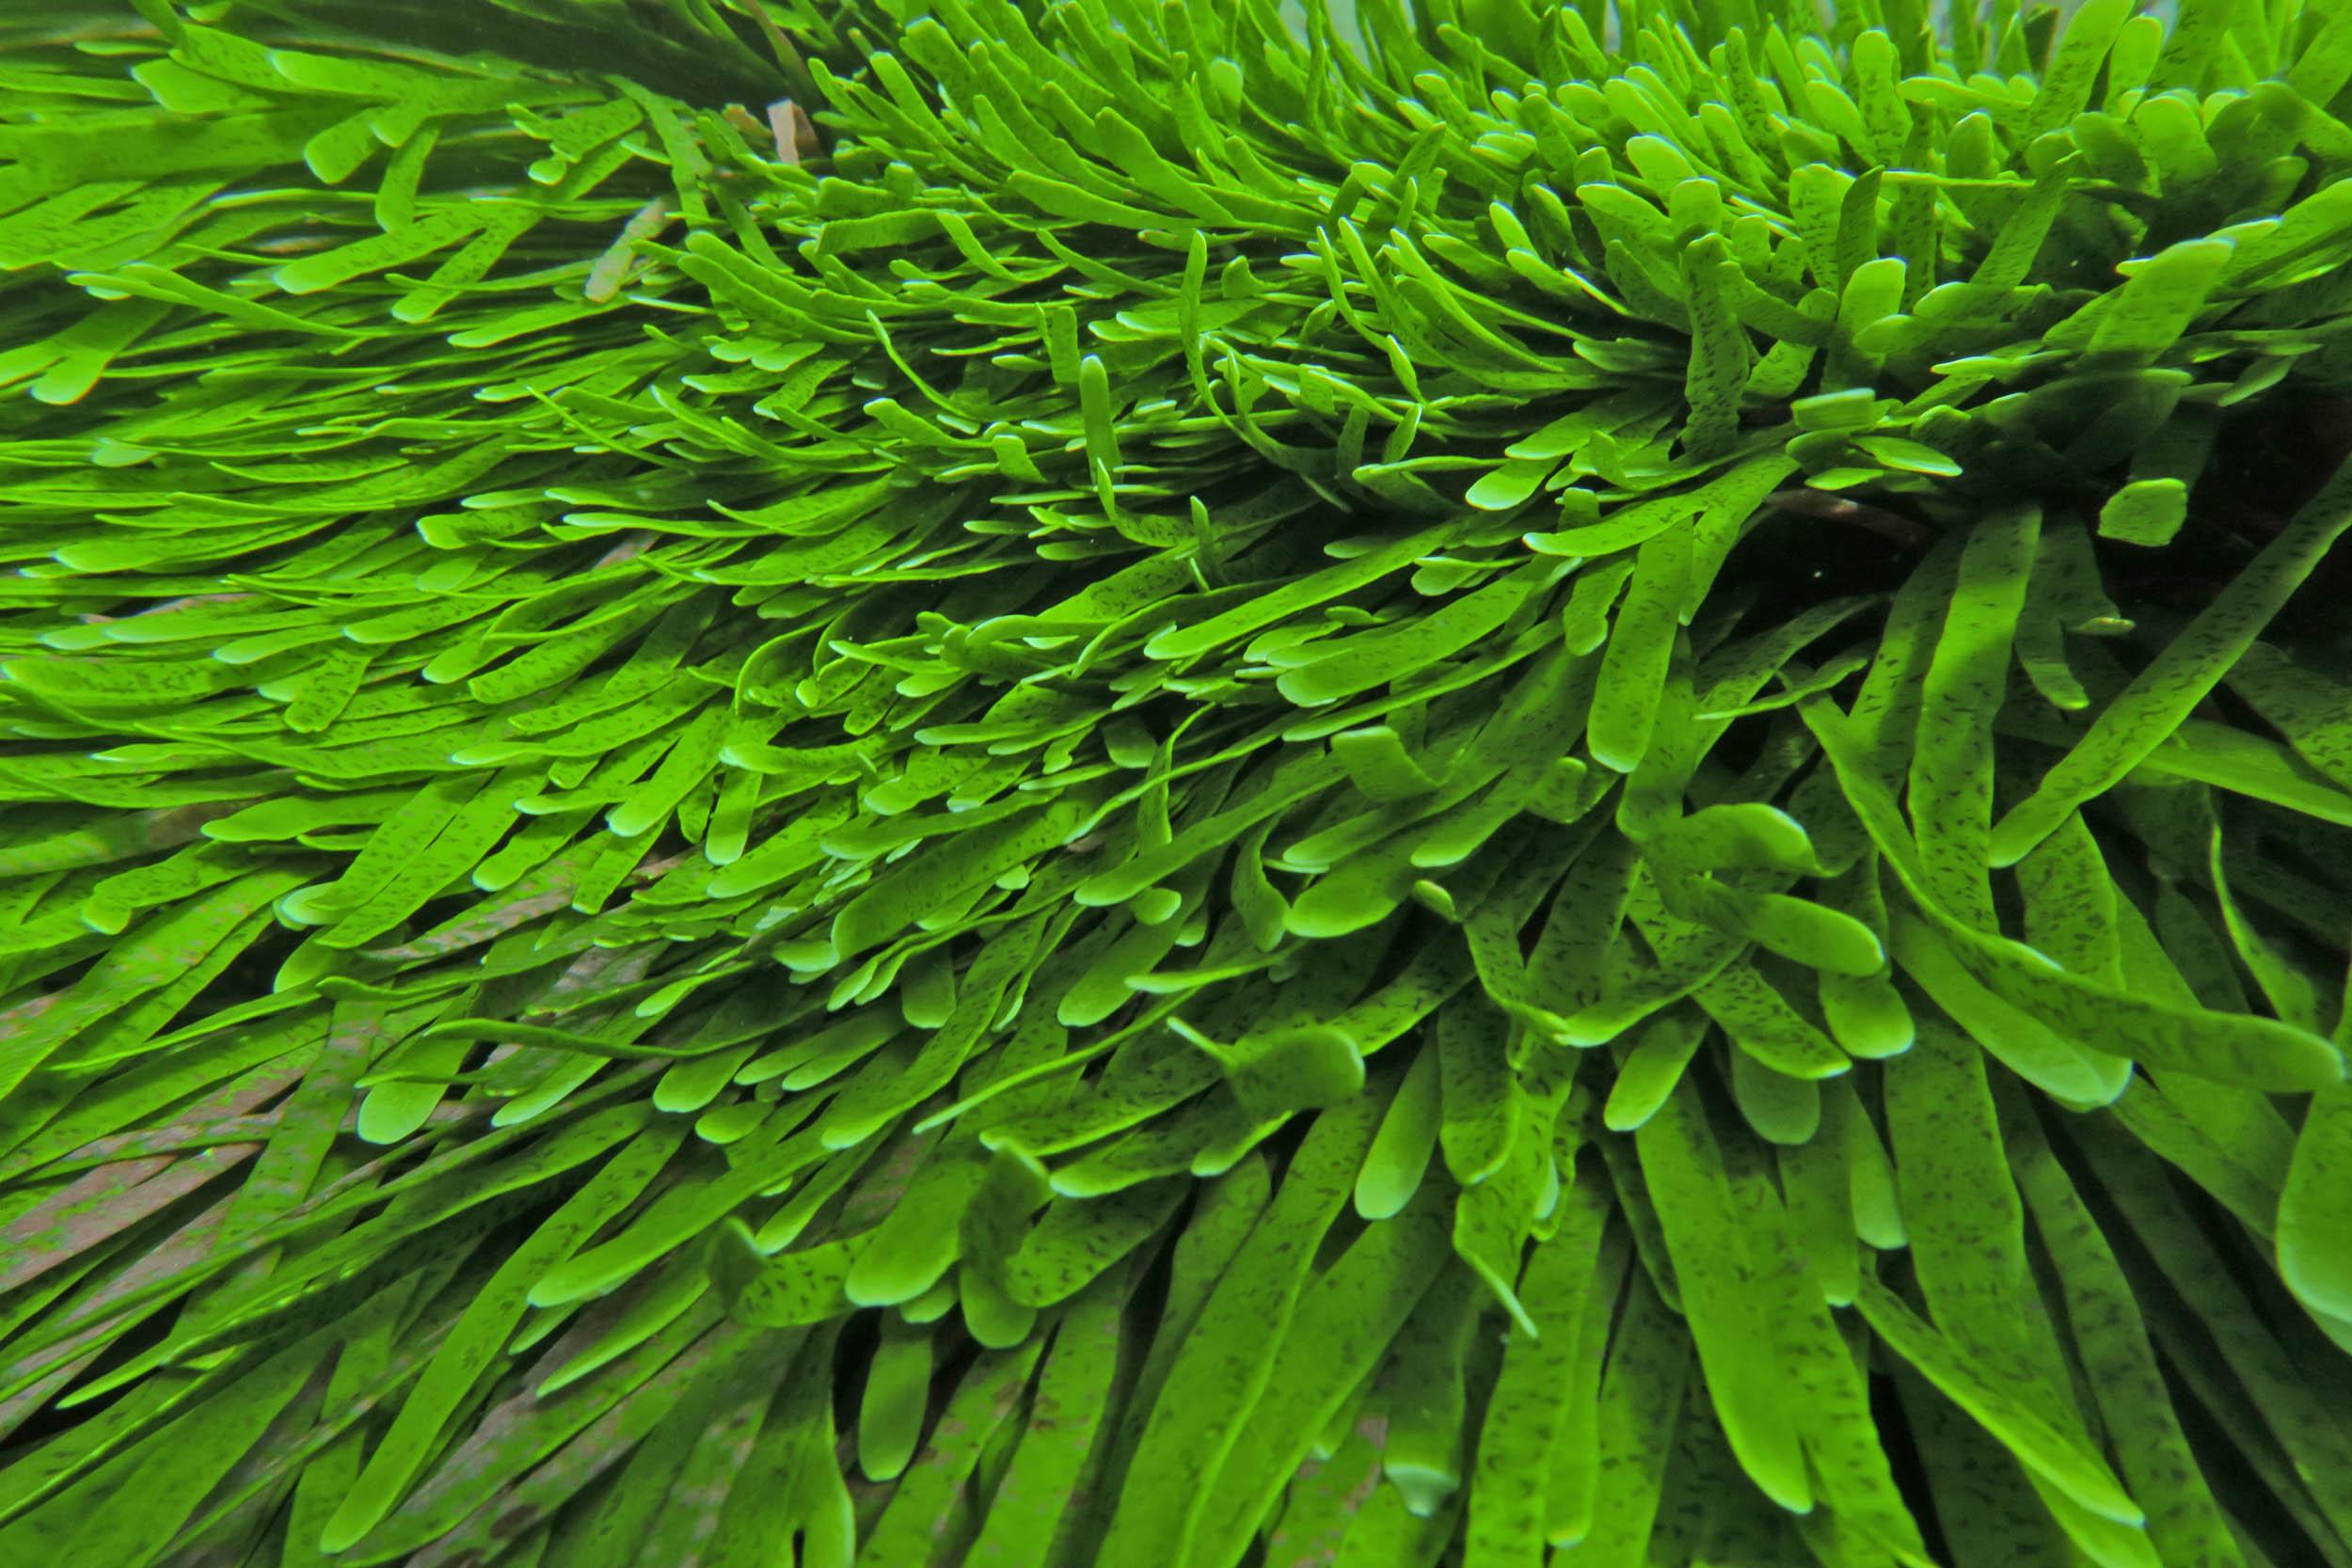 Ocean acidification will harm seagrass